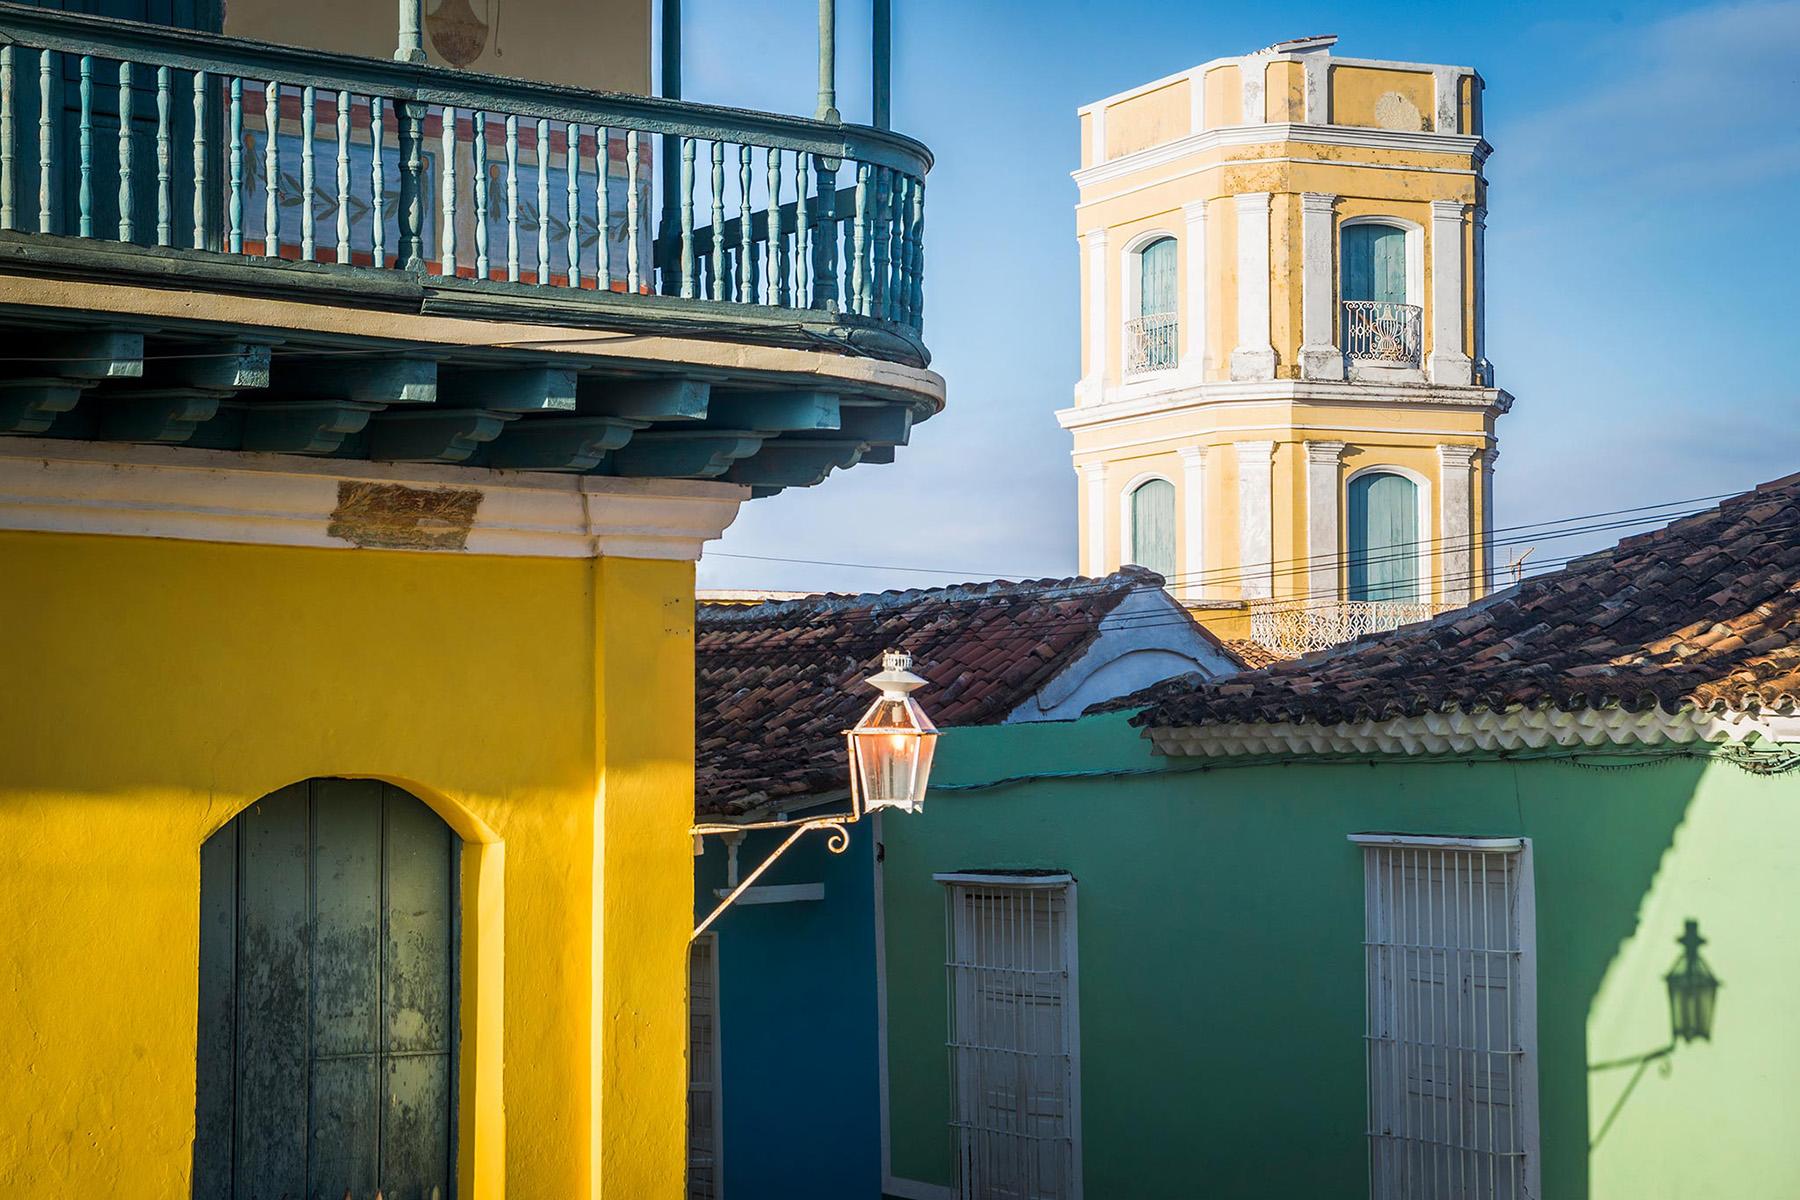 Alejandro_Perez_Travels_Cuba-Central_Trinidad_Tower.jpg